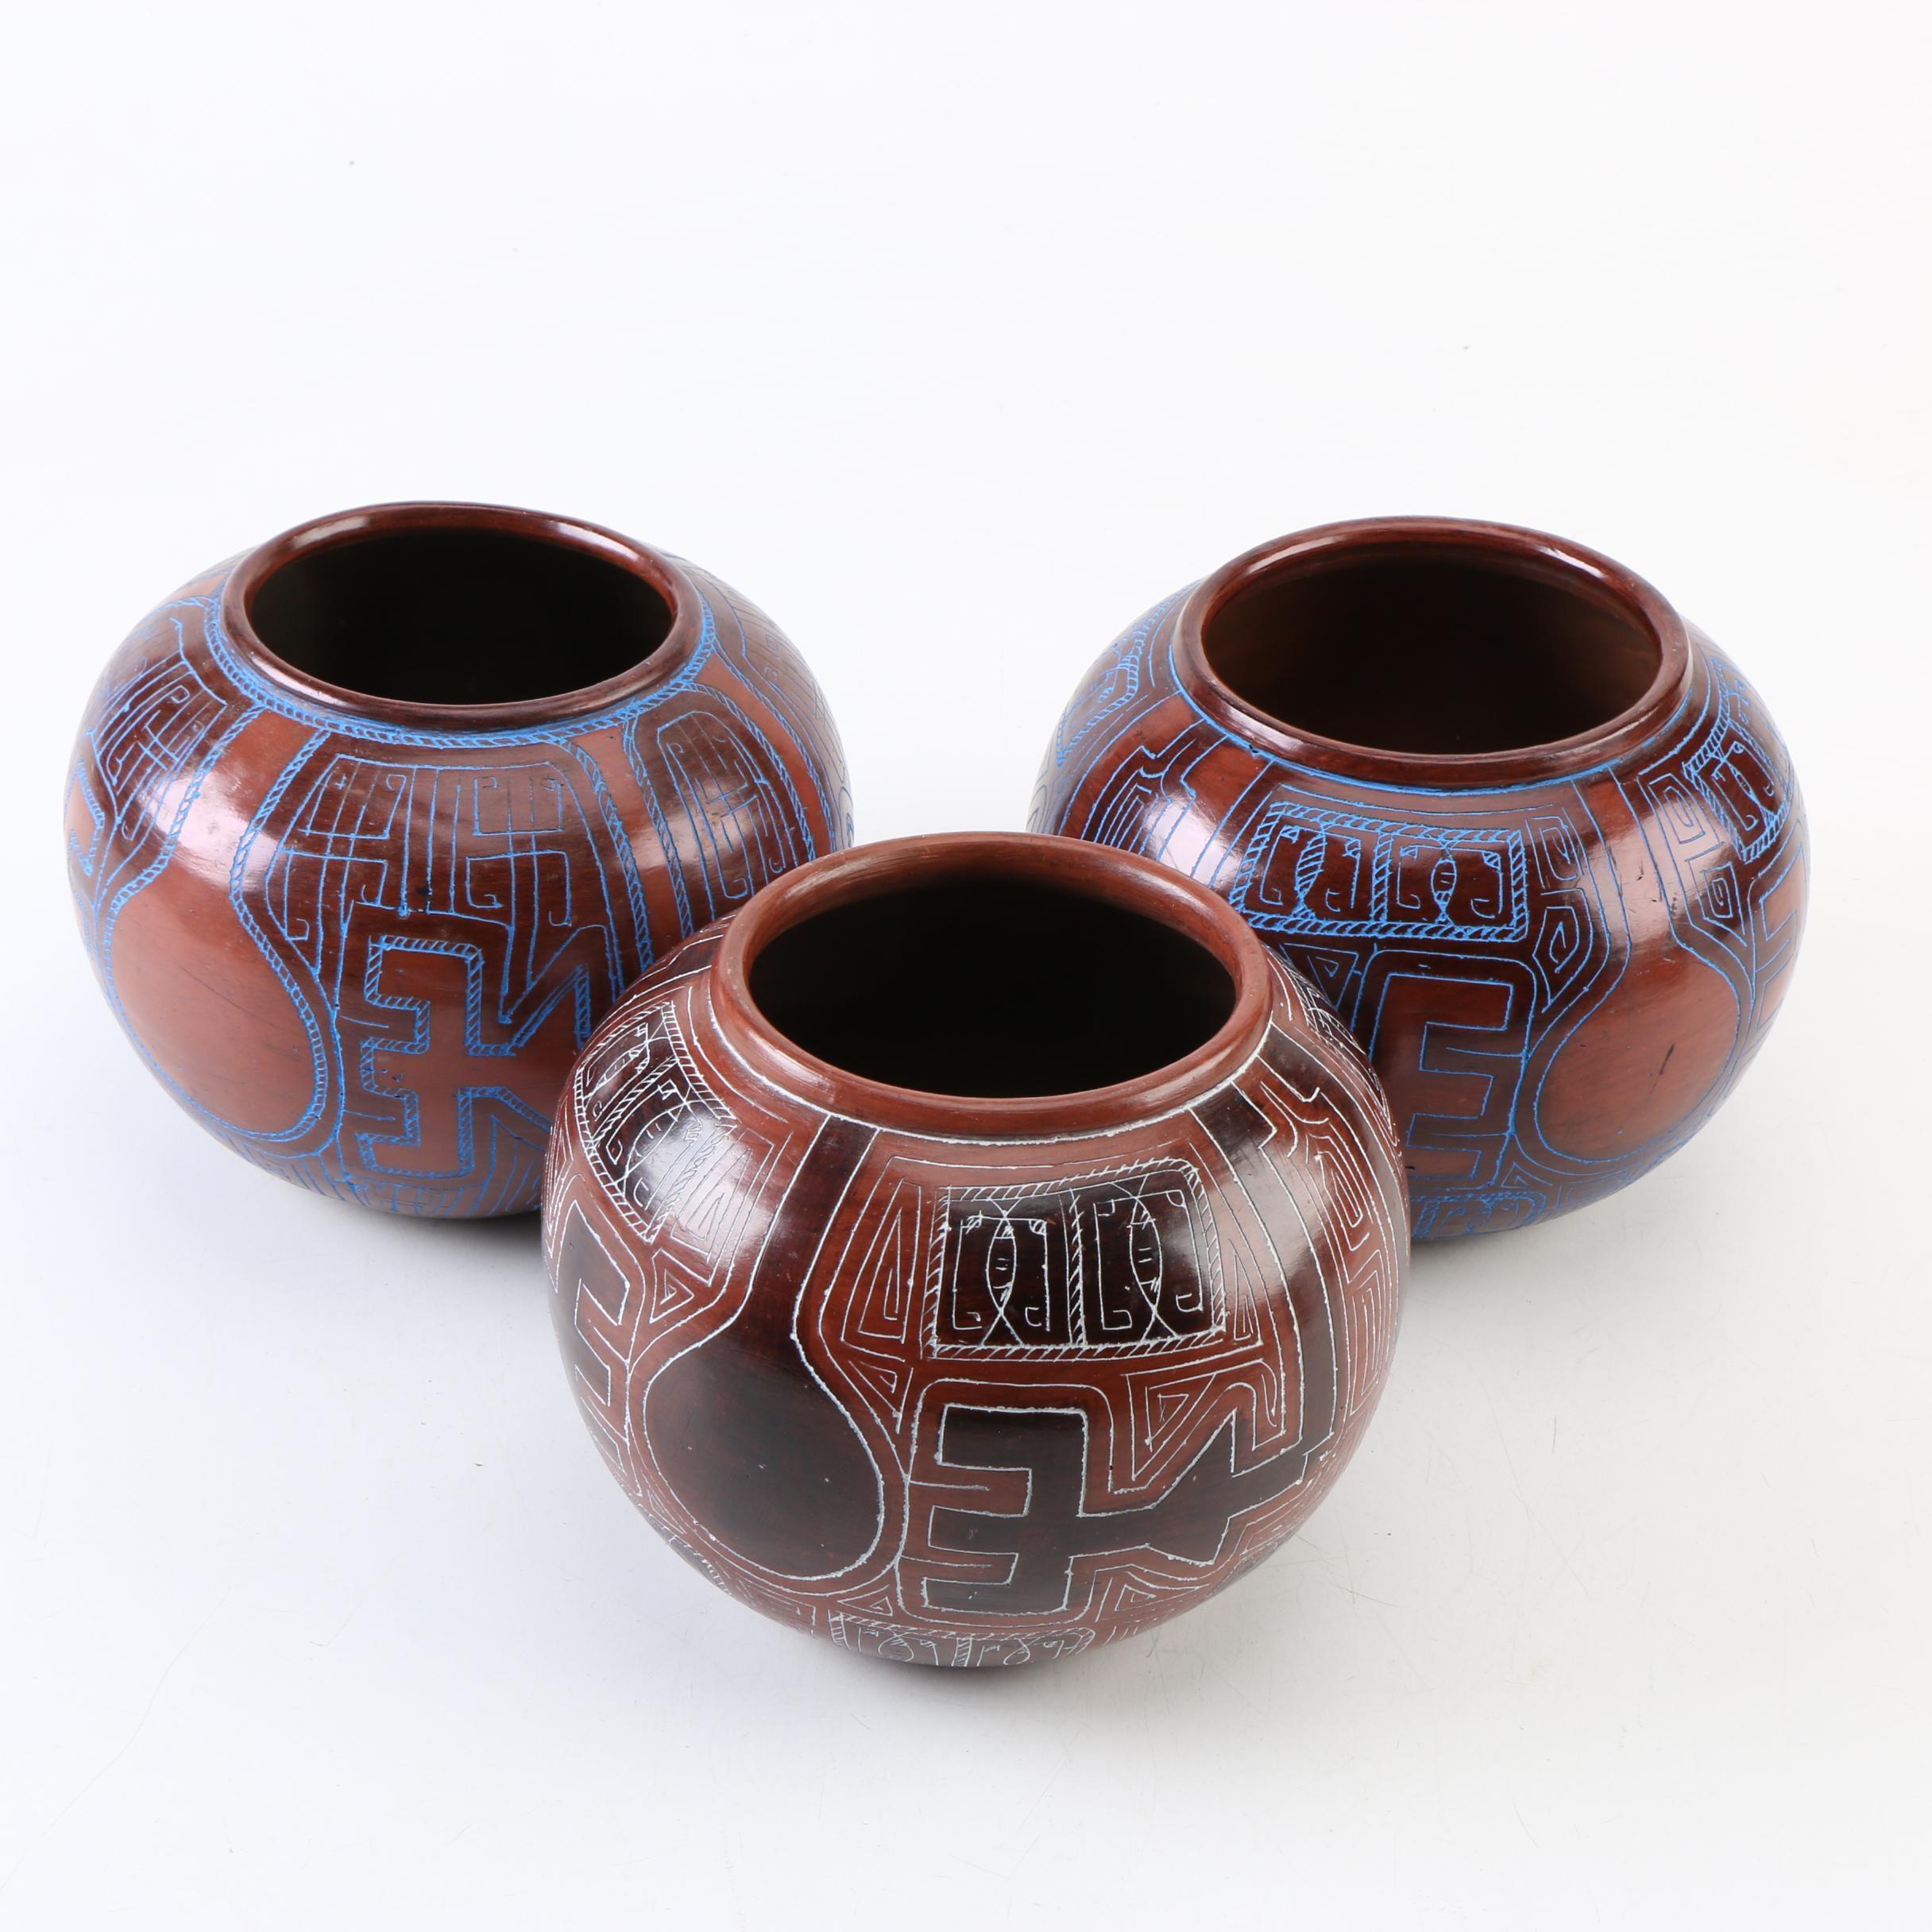 Handmade Brazilian Earthenware Pots